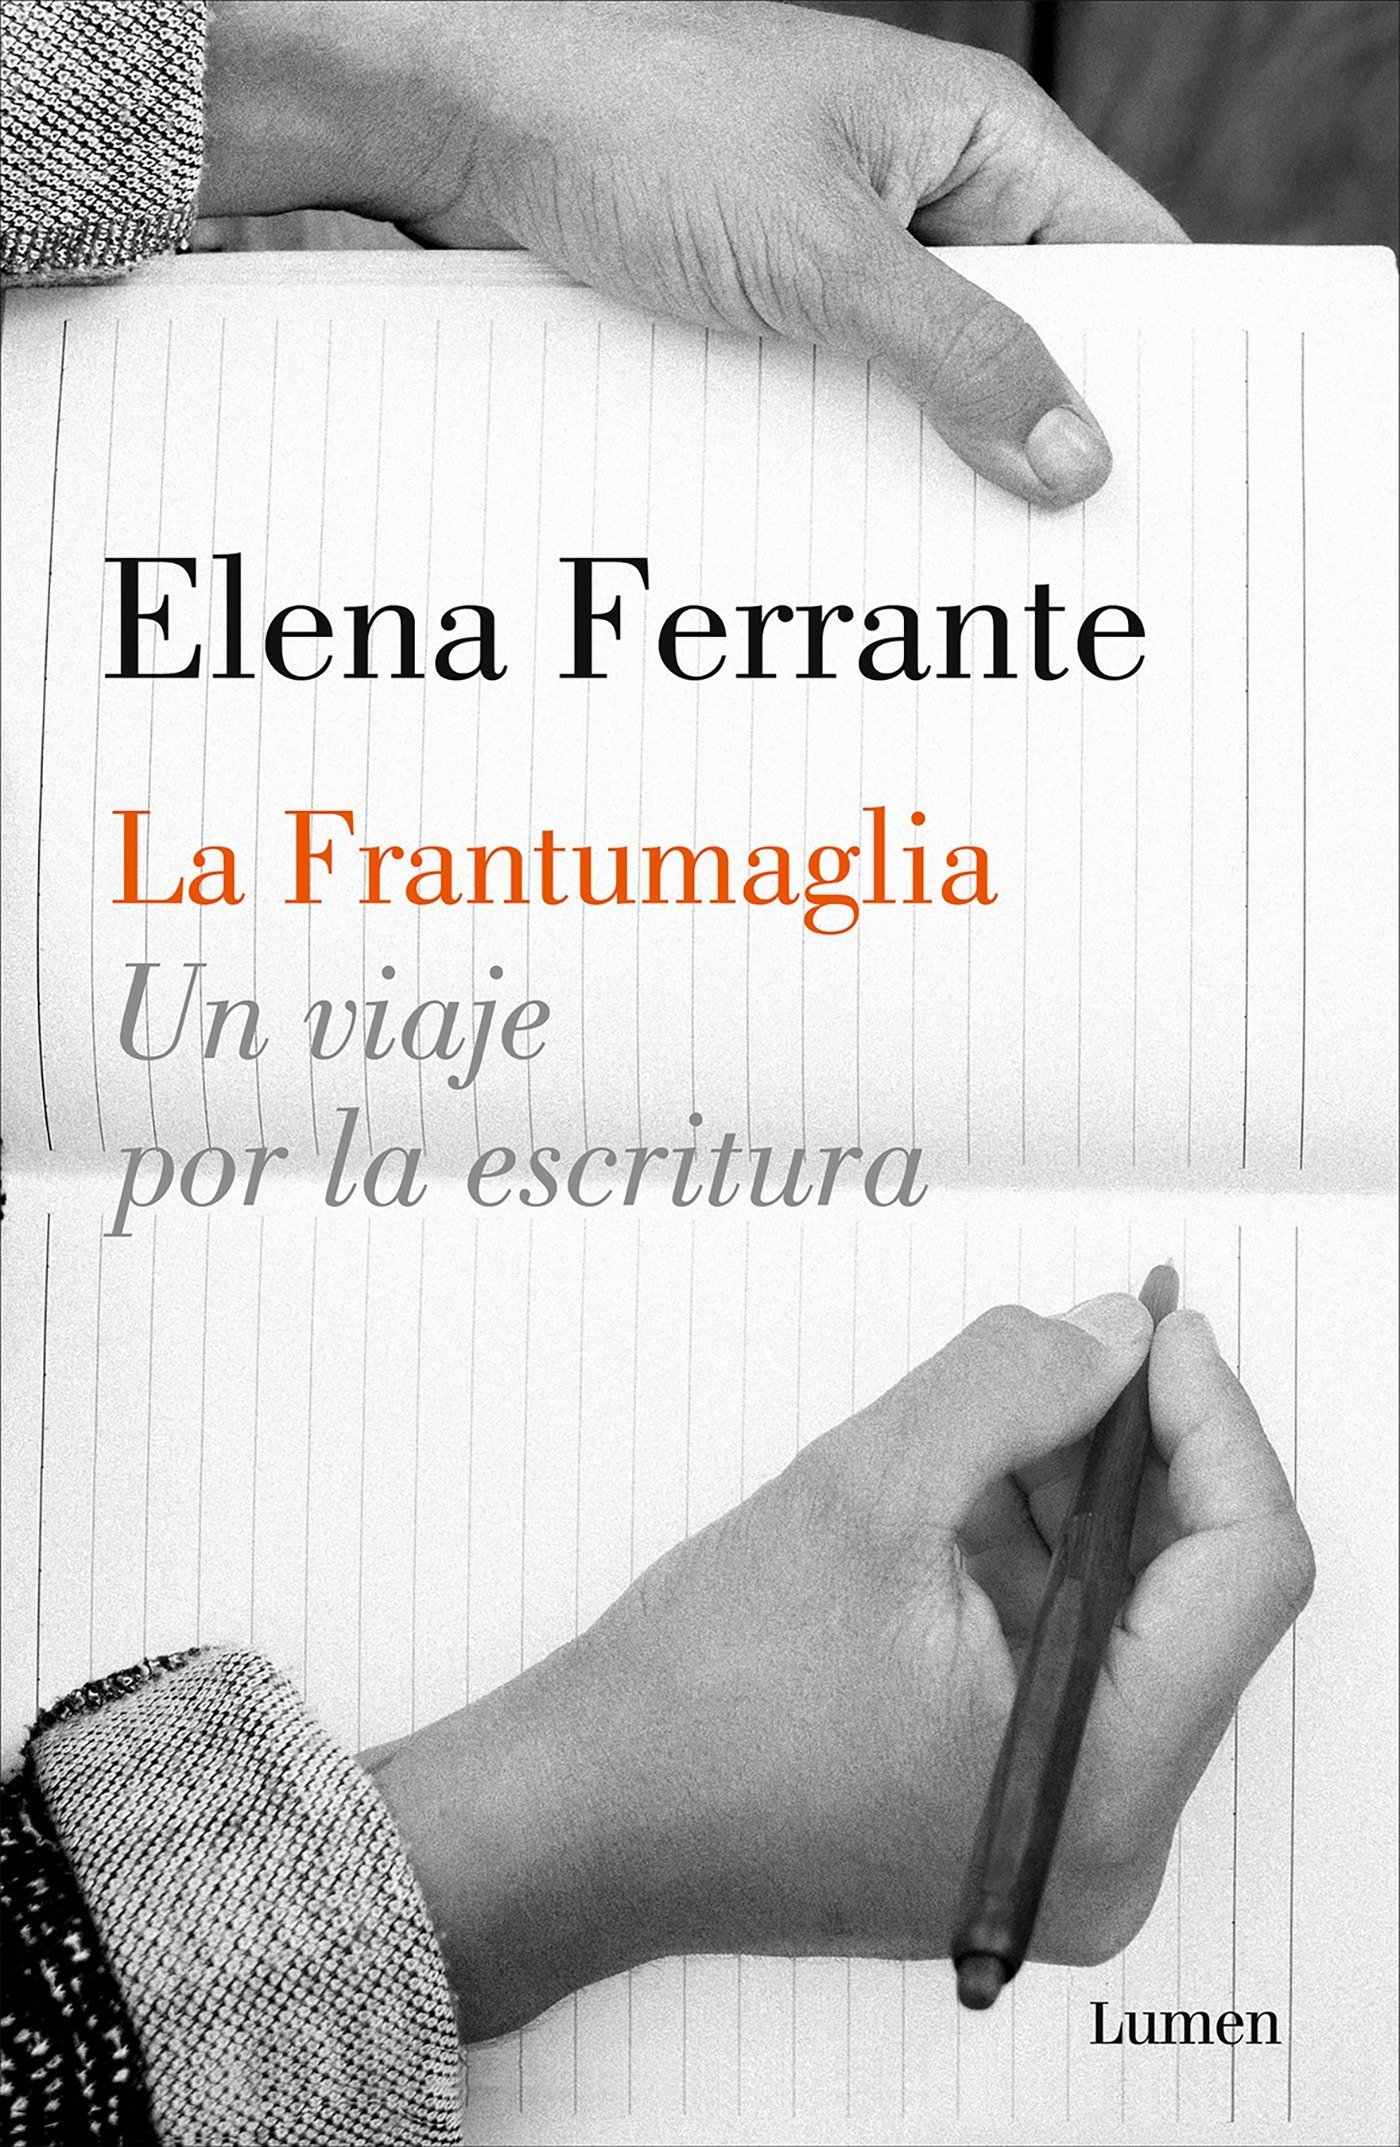 La frantumaglia: Un viaje por la escritura (ENSAYO): Amazon.es: Elena Ferrante, Celia Filipetto Isicato;: Libros